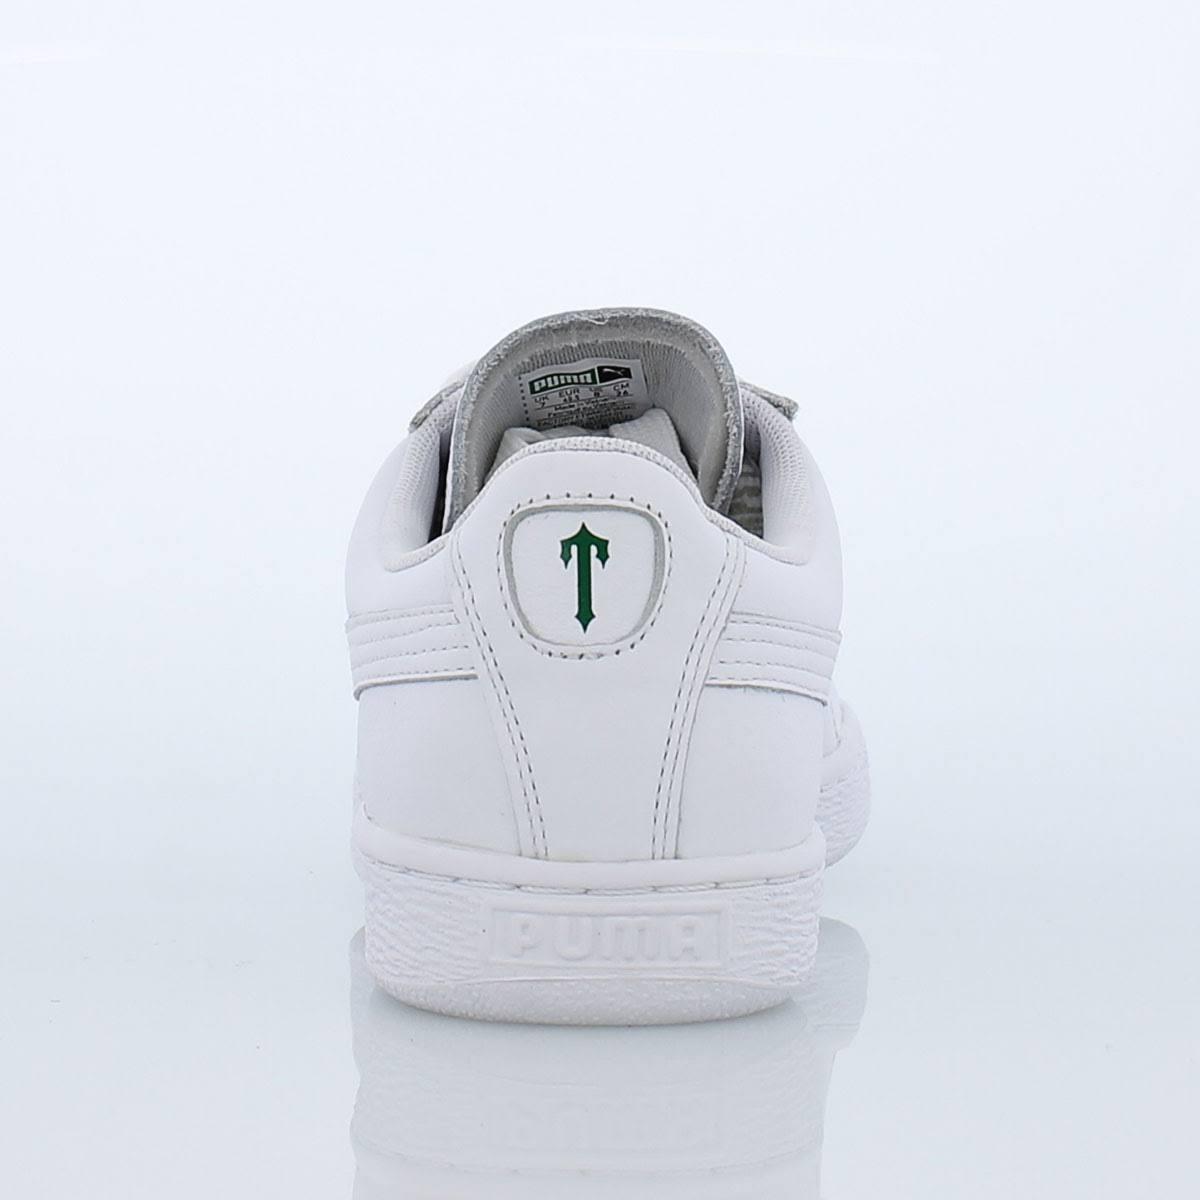 Blanco 10 blanco X Puma Basket 0 Glaciar Trapstar Gris Men Rn1xgIwq